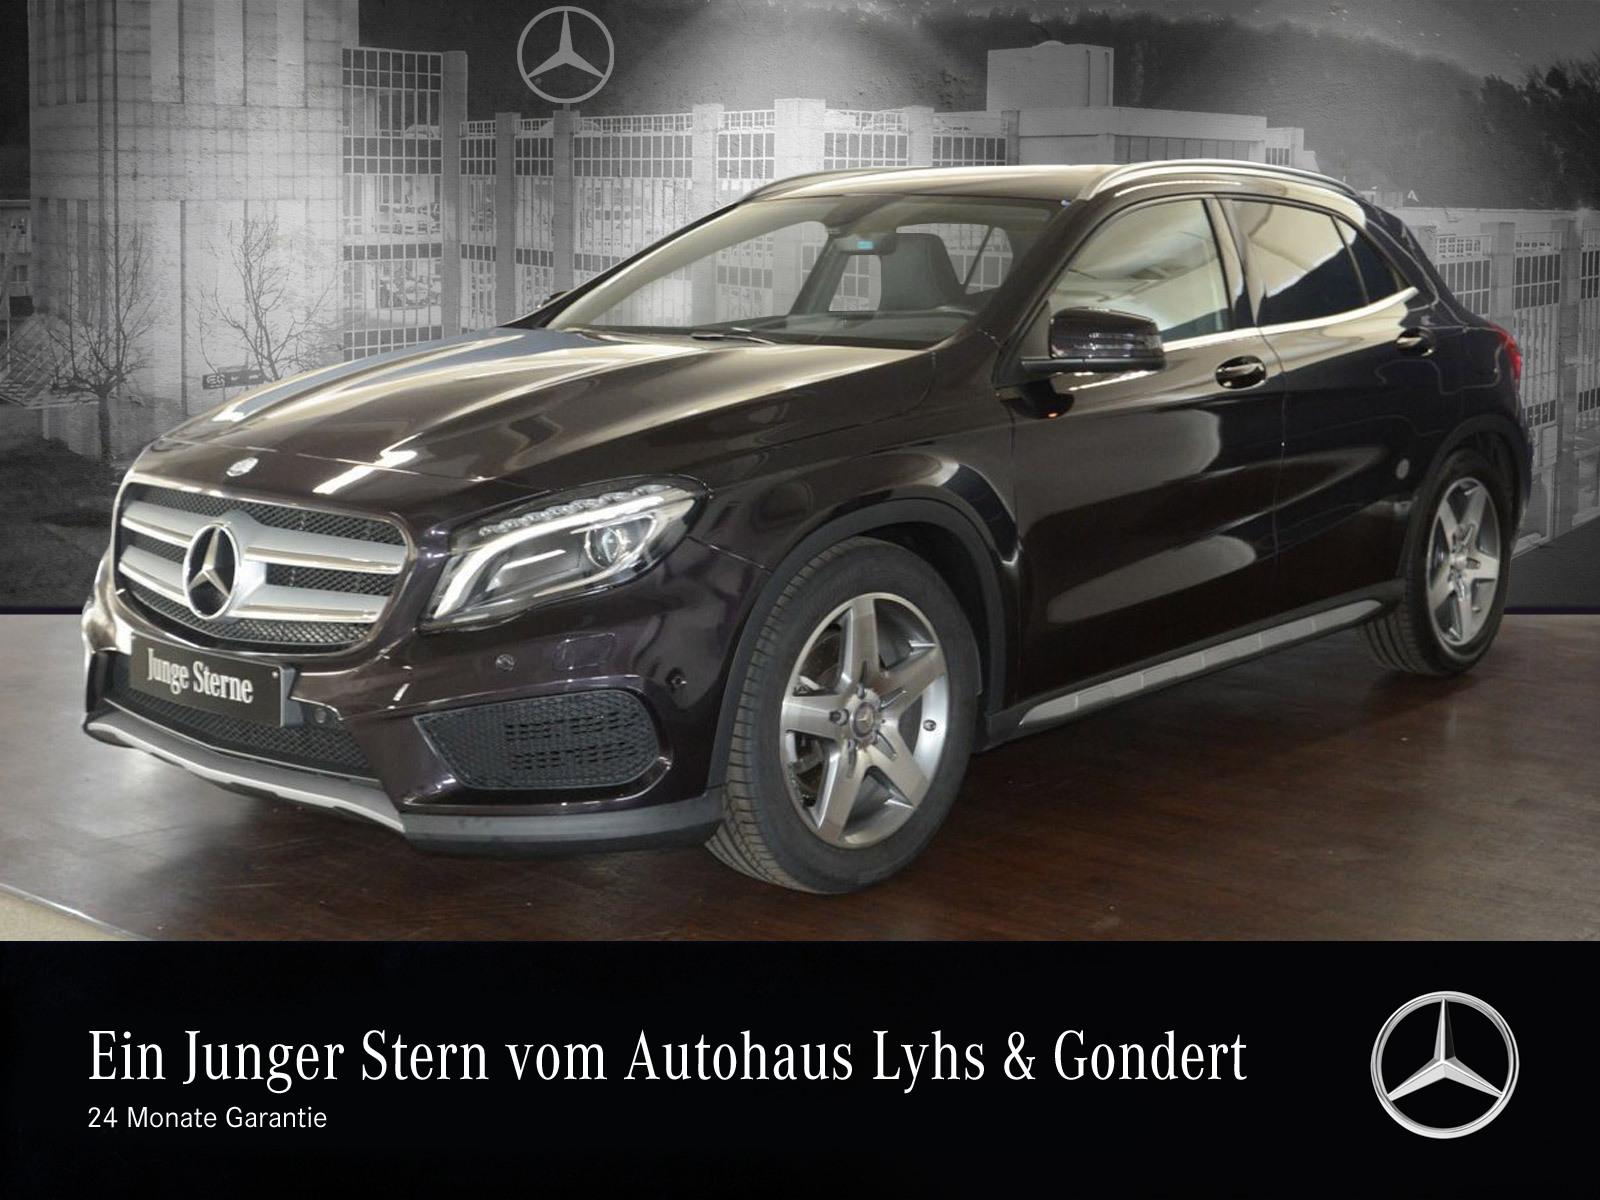 Mercedes-Benz GLA 220 CDI 4M AMG EUR6 Kamera Navi PDC, Jahr 2014, Diesel